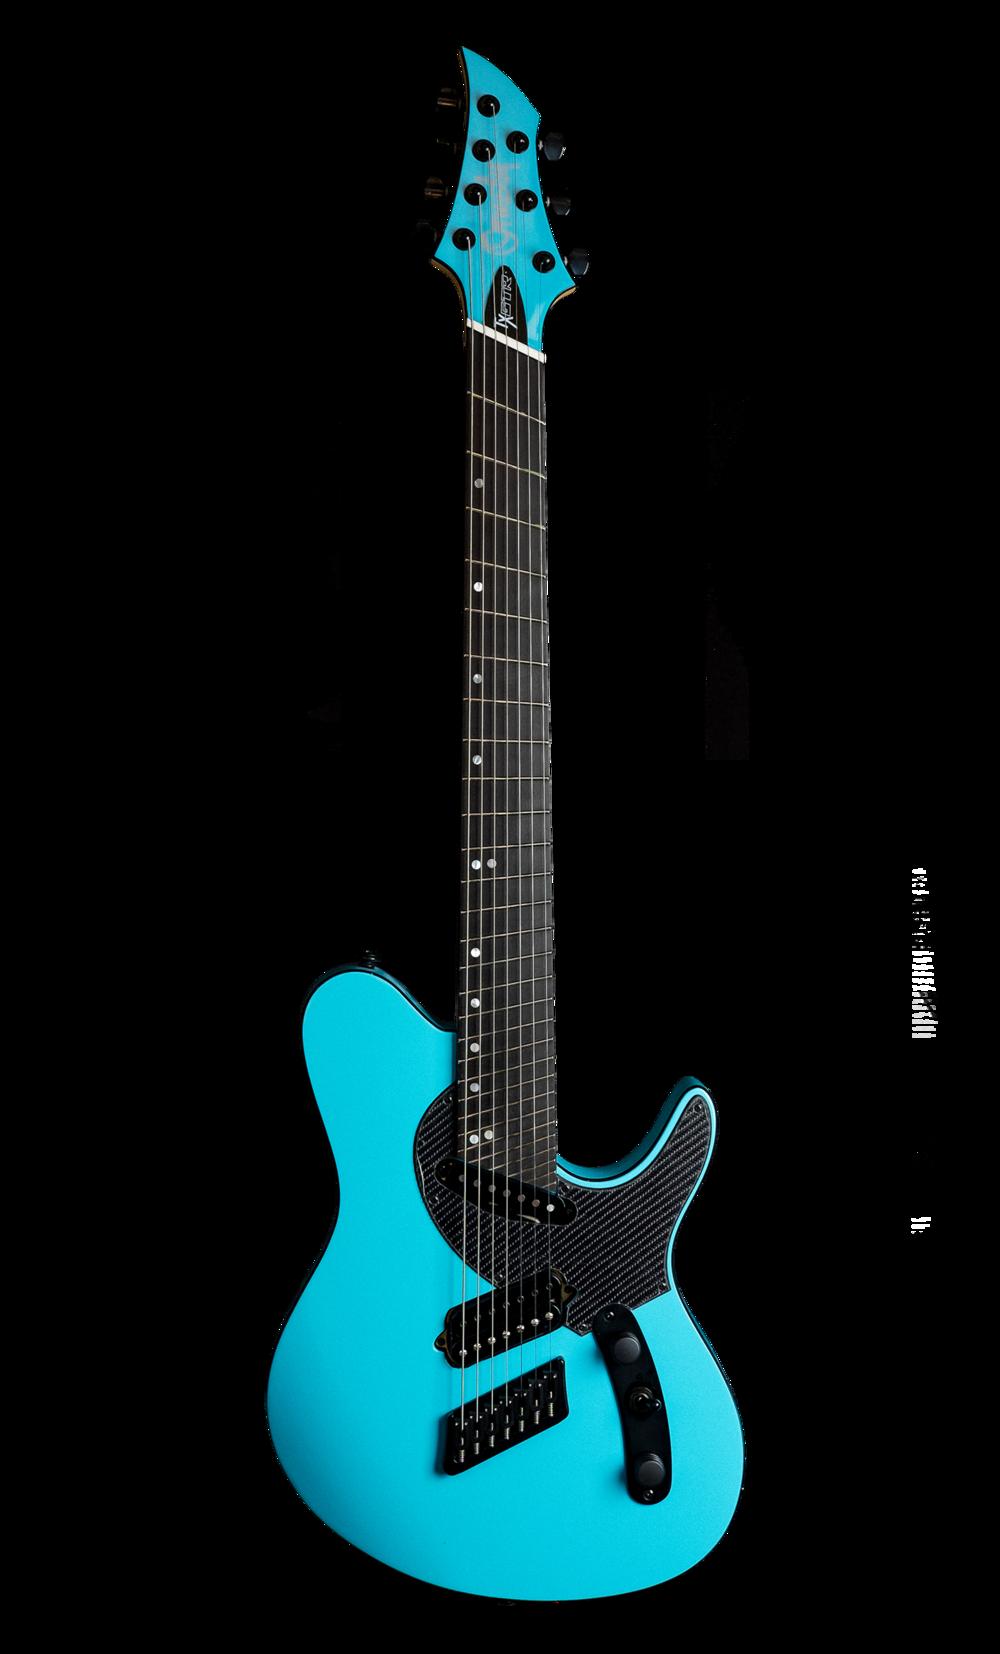 TX GTR Carbon MULTISCALE - Azure Blue (6, 7 & 8 String)